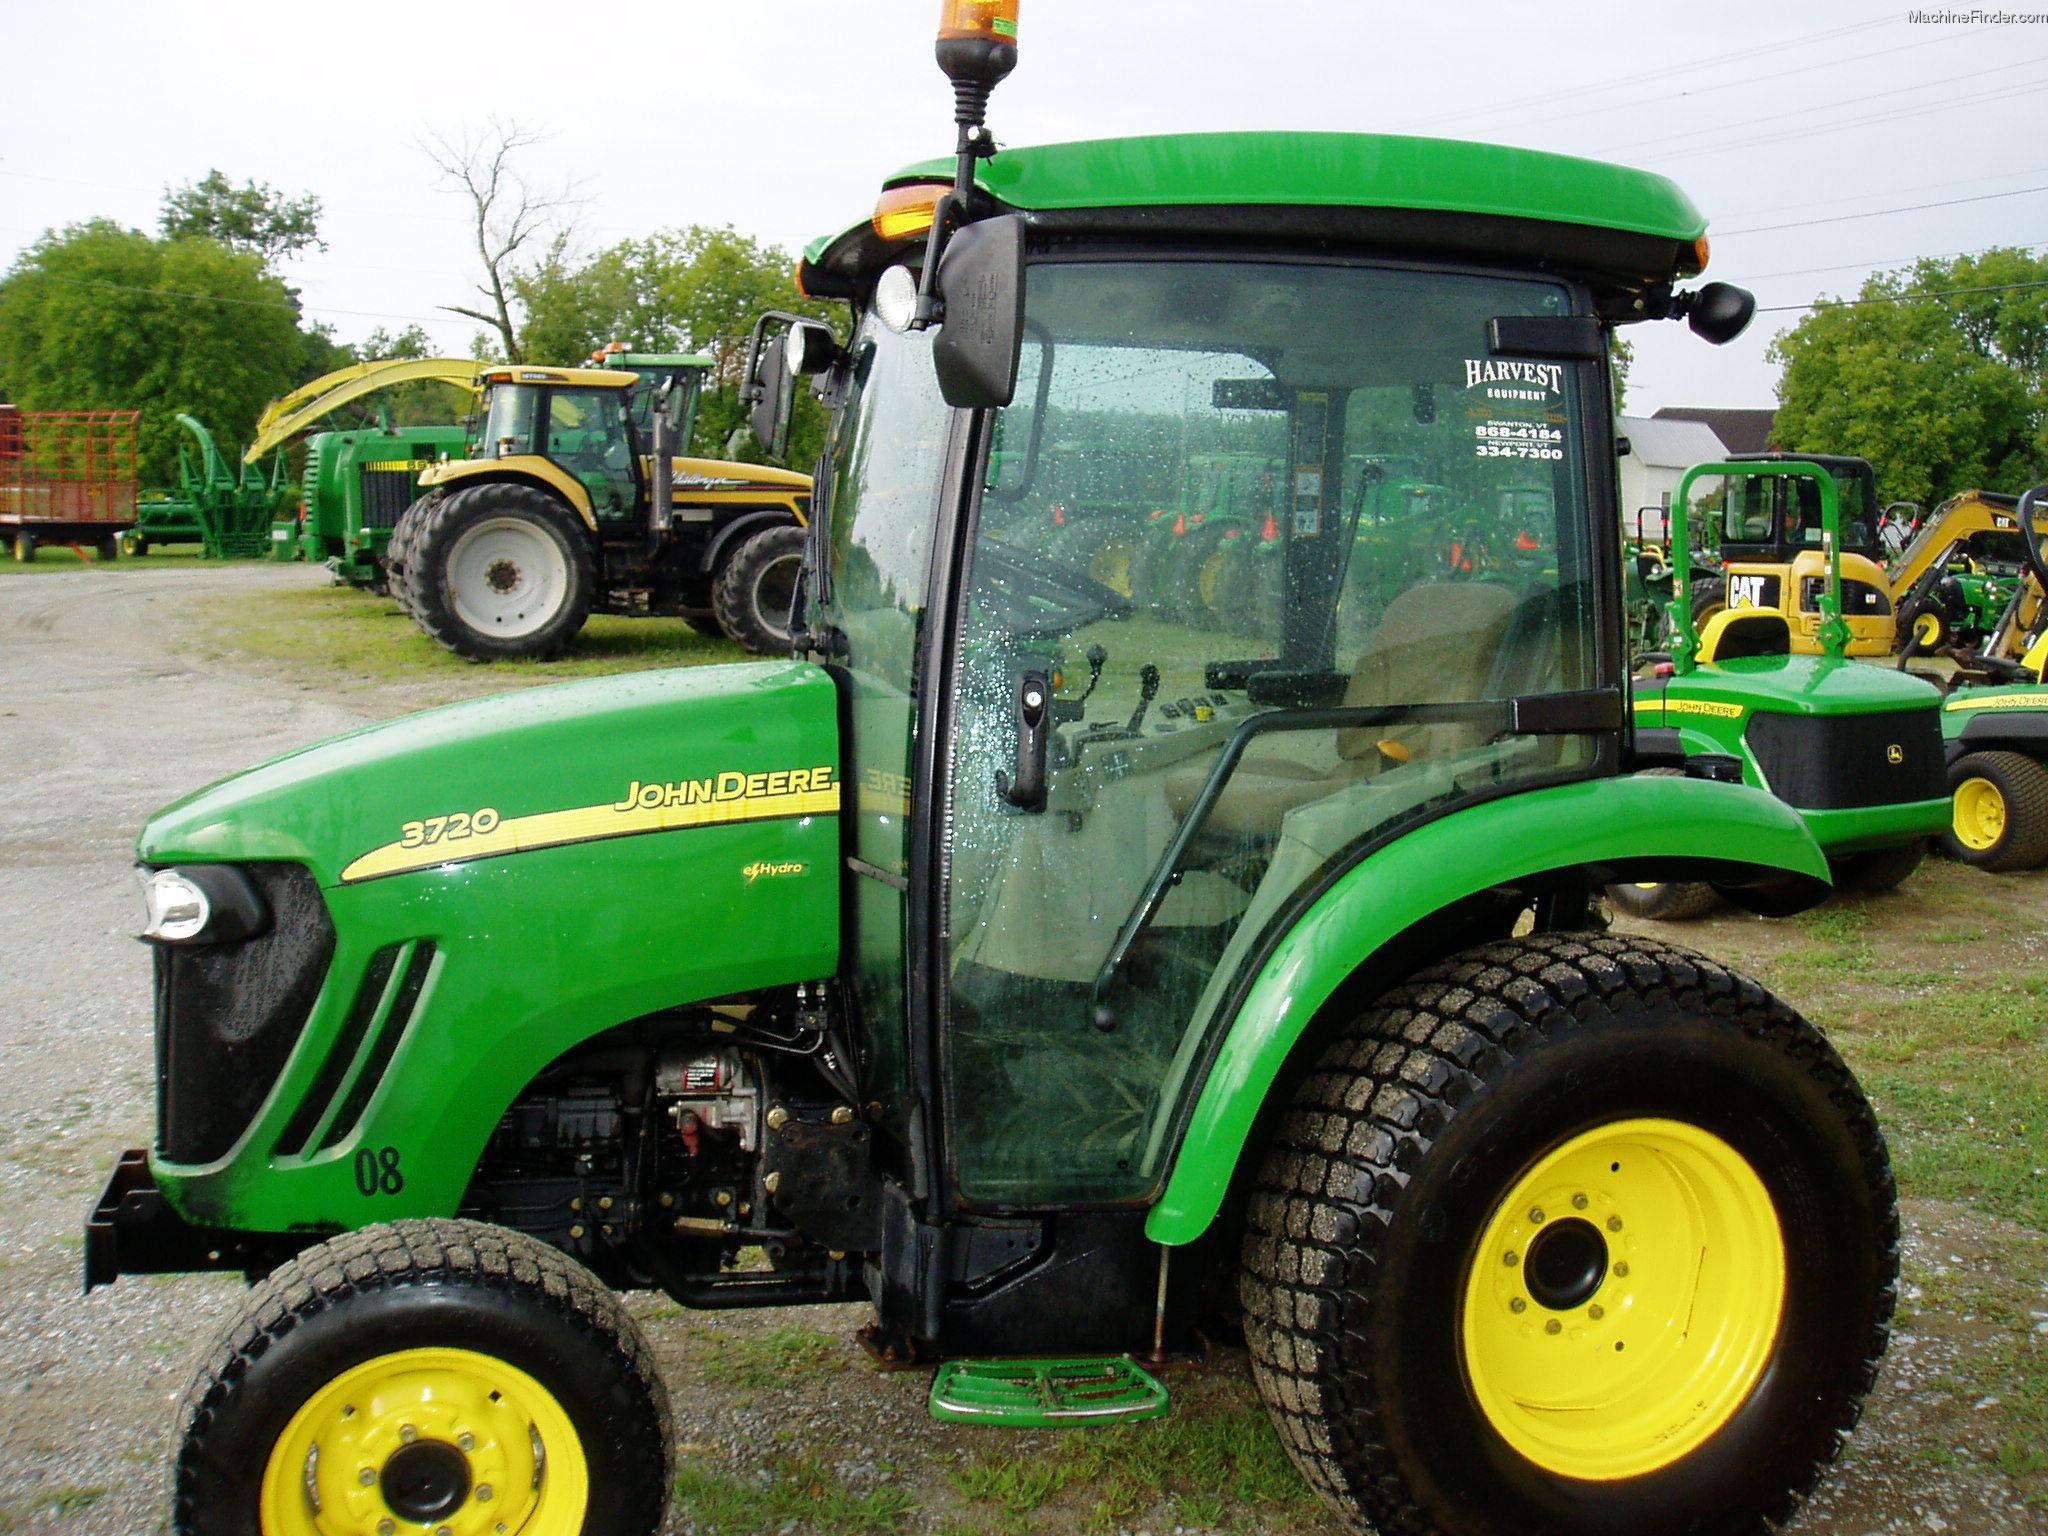 2008 John Deere 3720 Tractors - Utility (40-100hp) - John ...